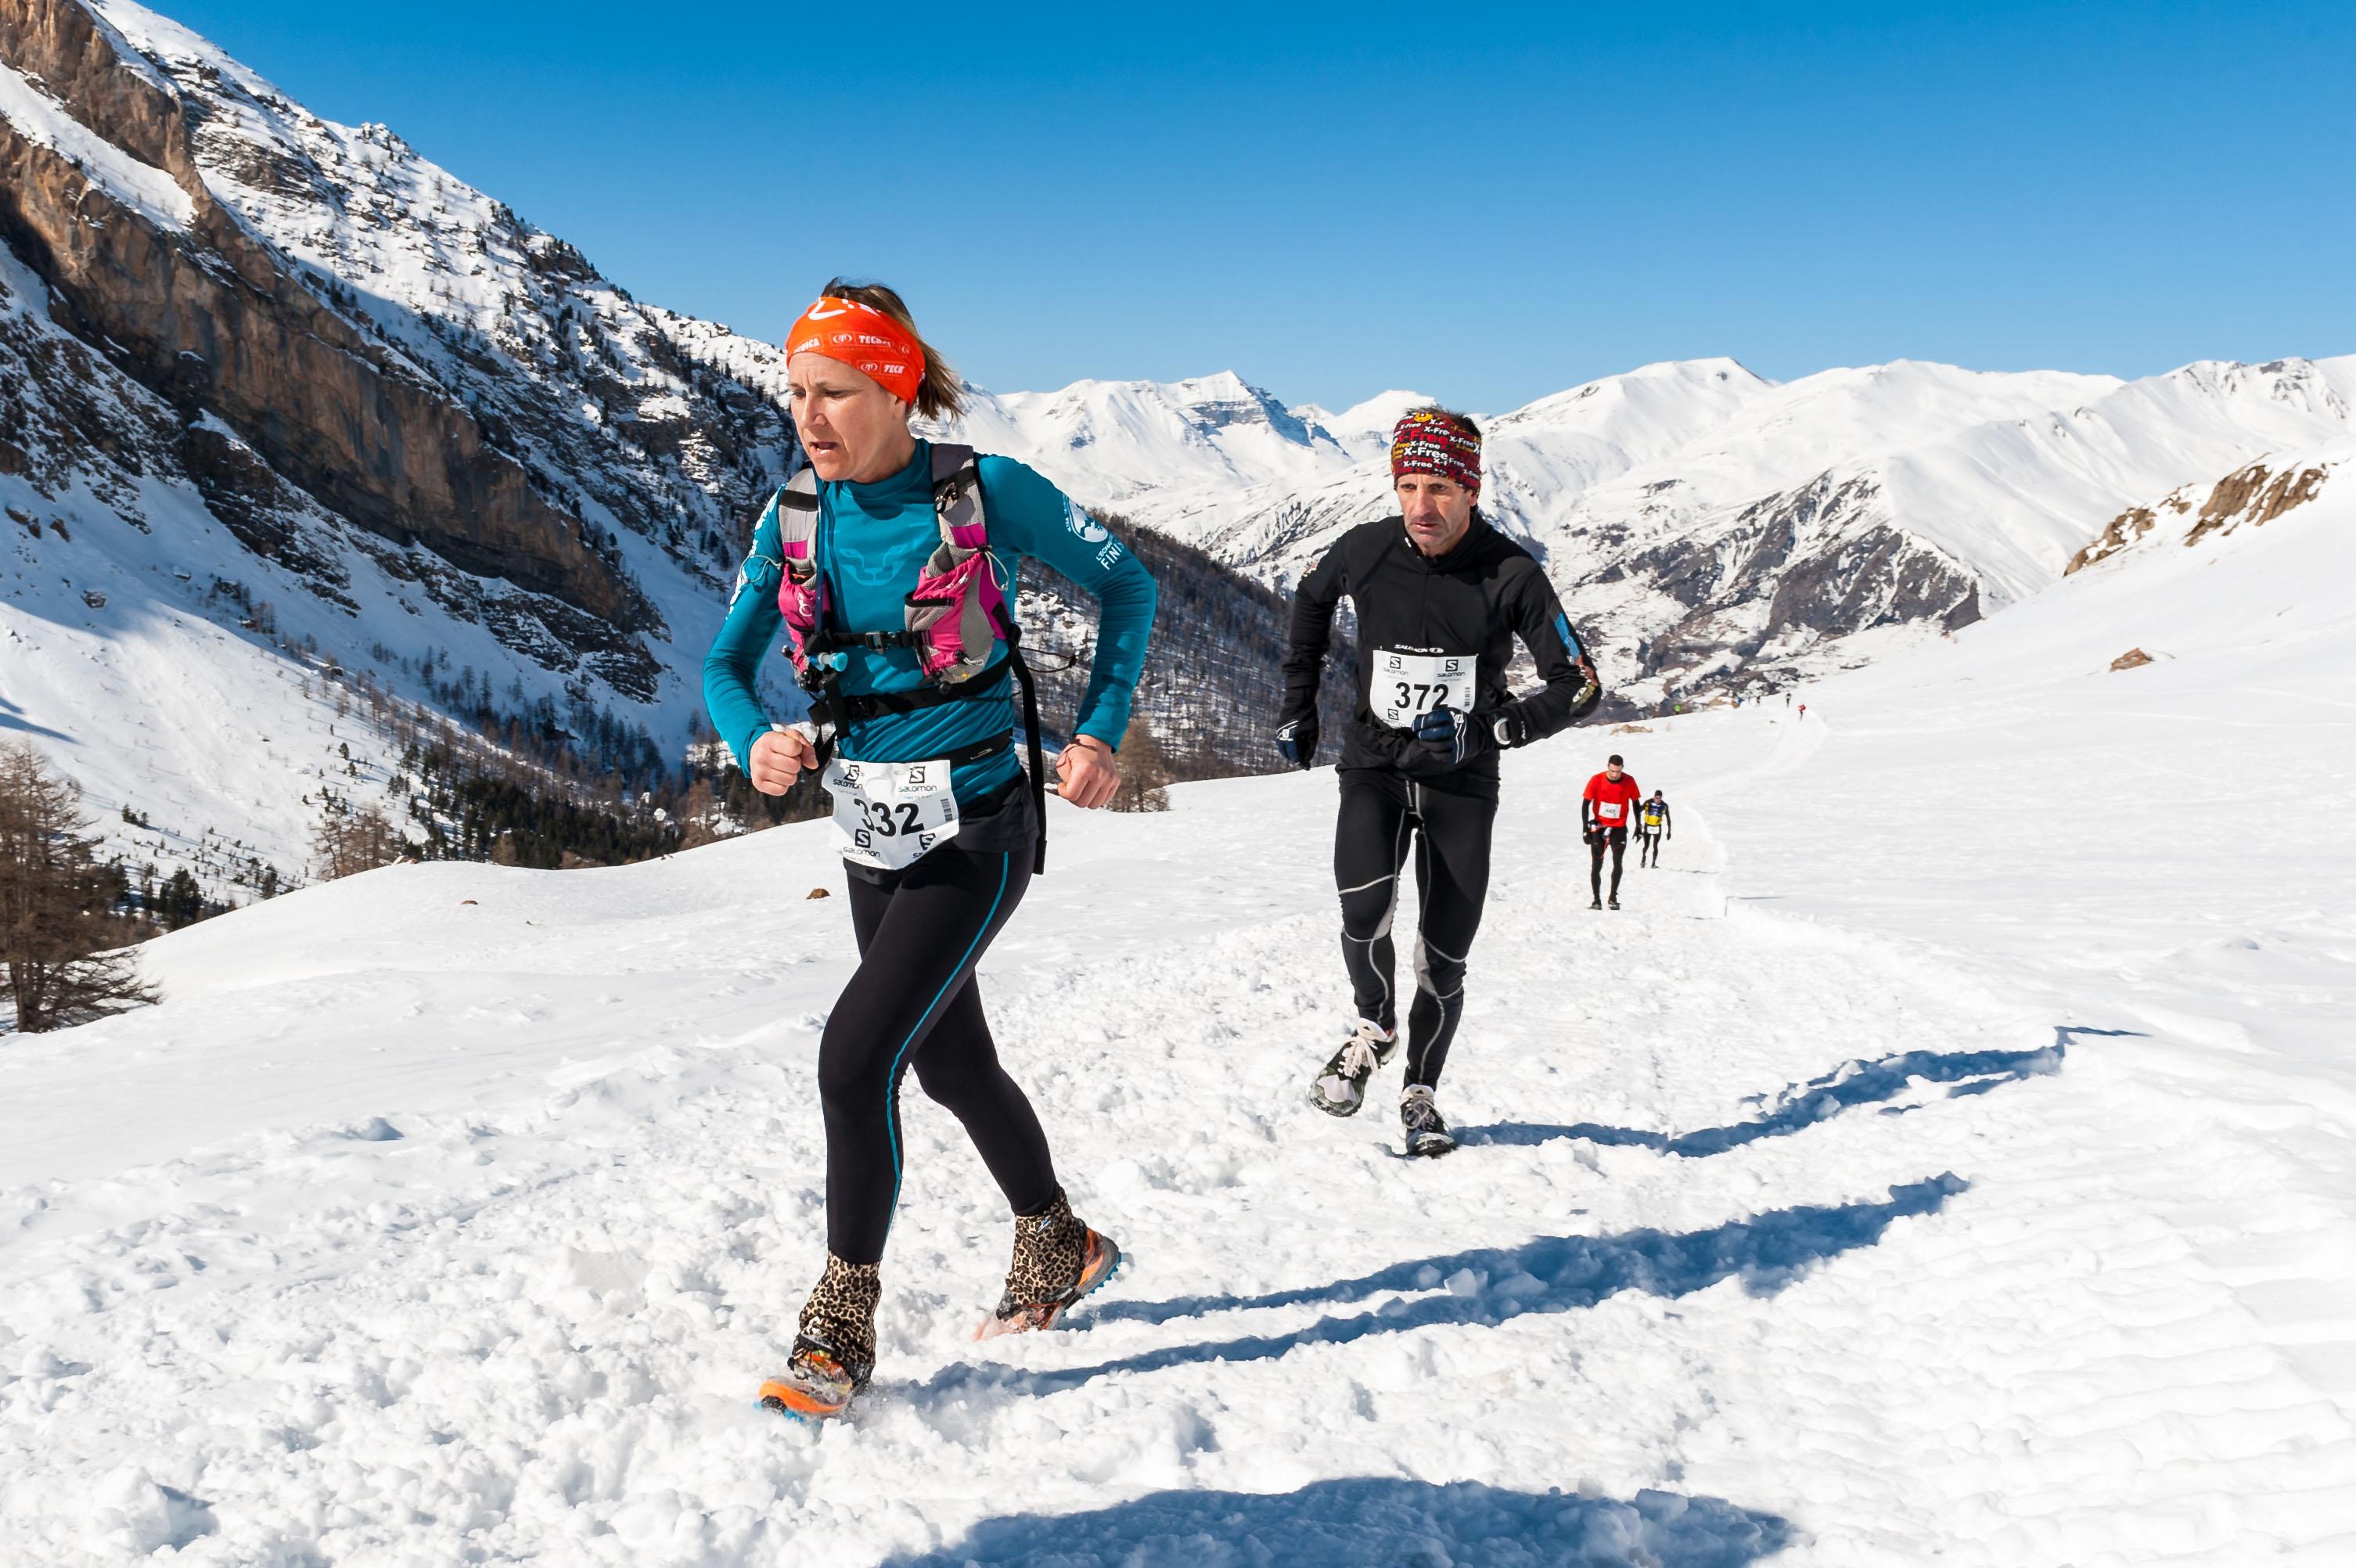 Irina Malejonock première 22 km photo Rémi Morel - UBAYE SNOW TRAIL SALOMON UNE 8EME EDITION FORT REUSSIE ! 19-02-2017 RESULTATS ET VIDEO